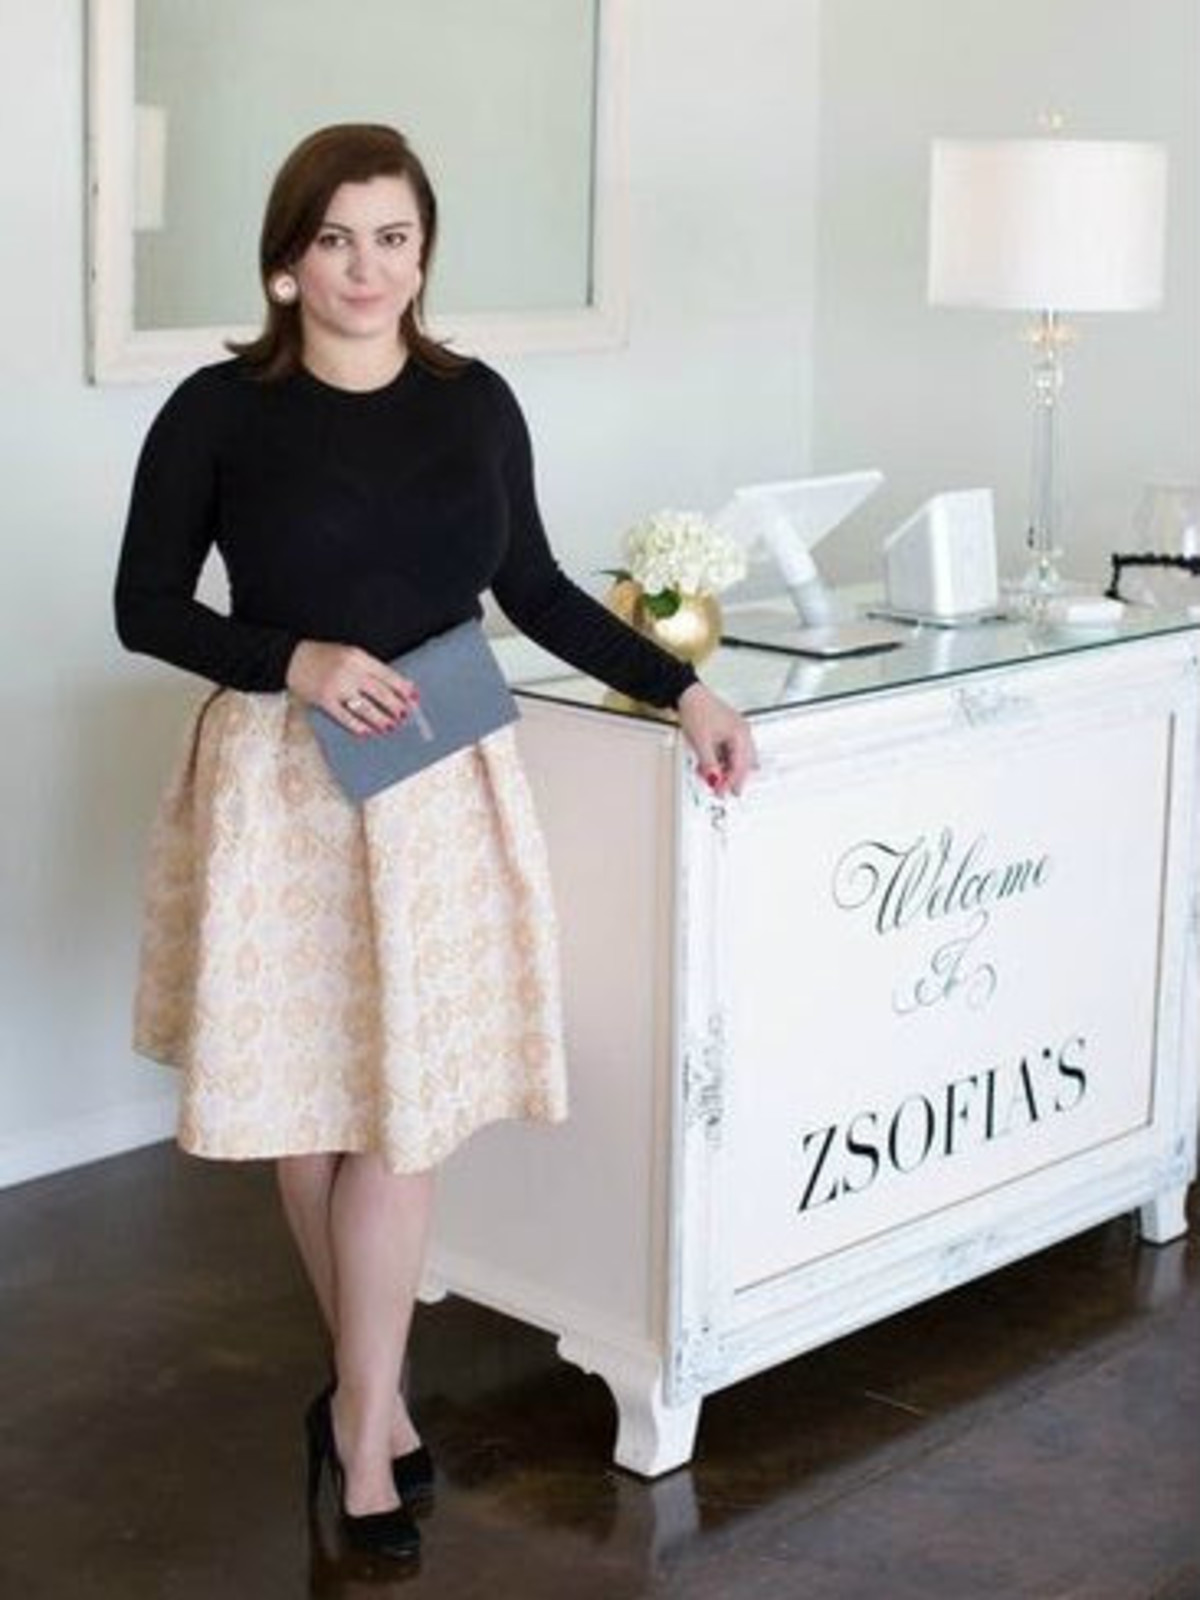 Zsofia's Fine Lingerie